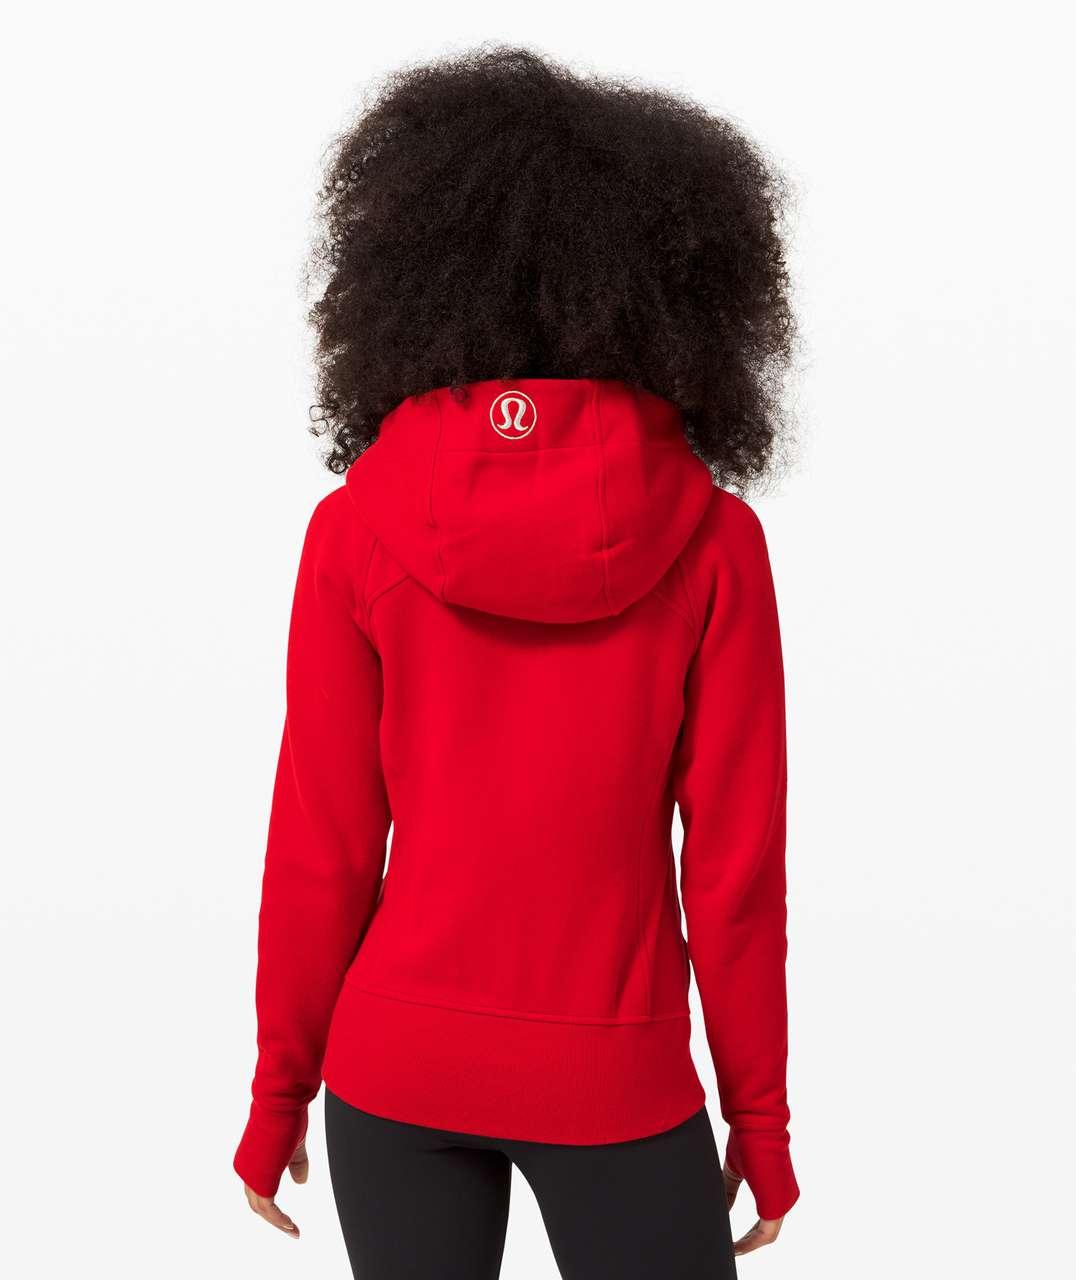 Lululemon Scuba Hoodie *Light Cotton Fleece - Dark Red / Gold